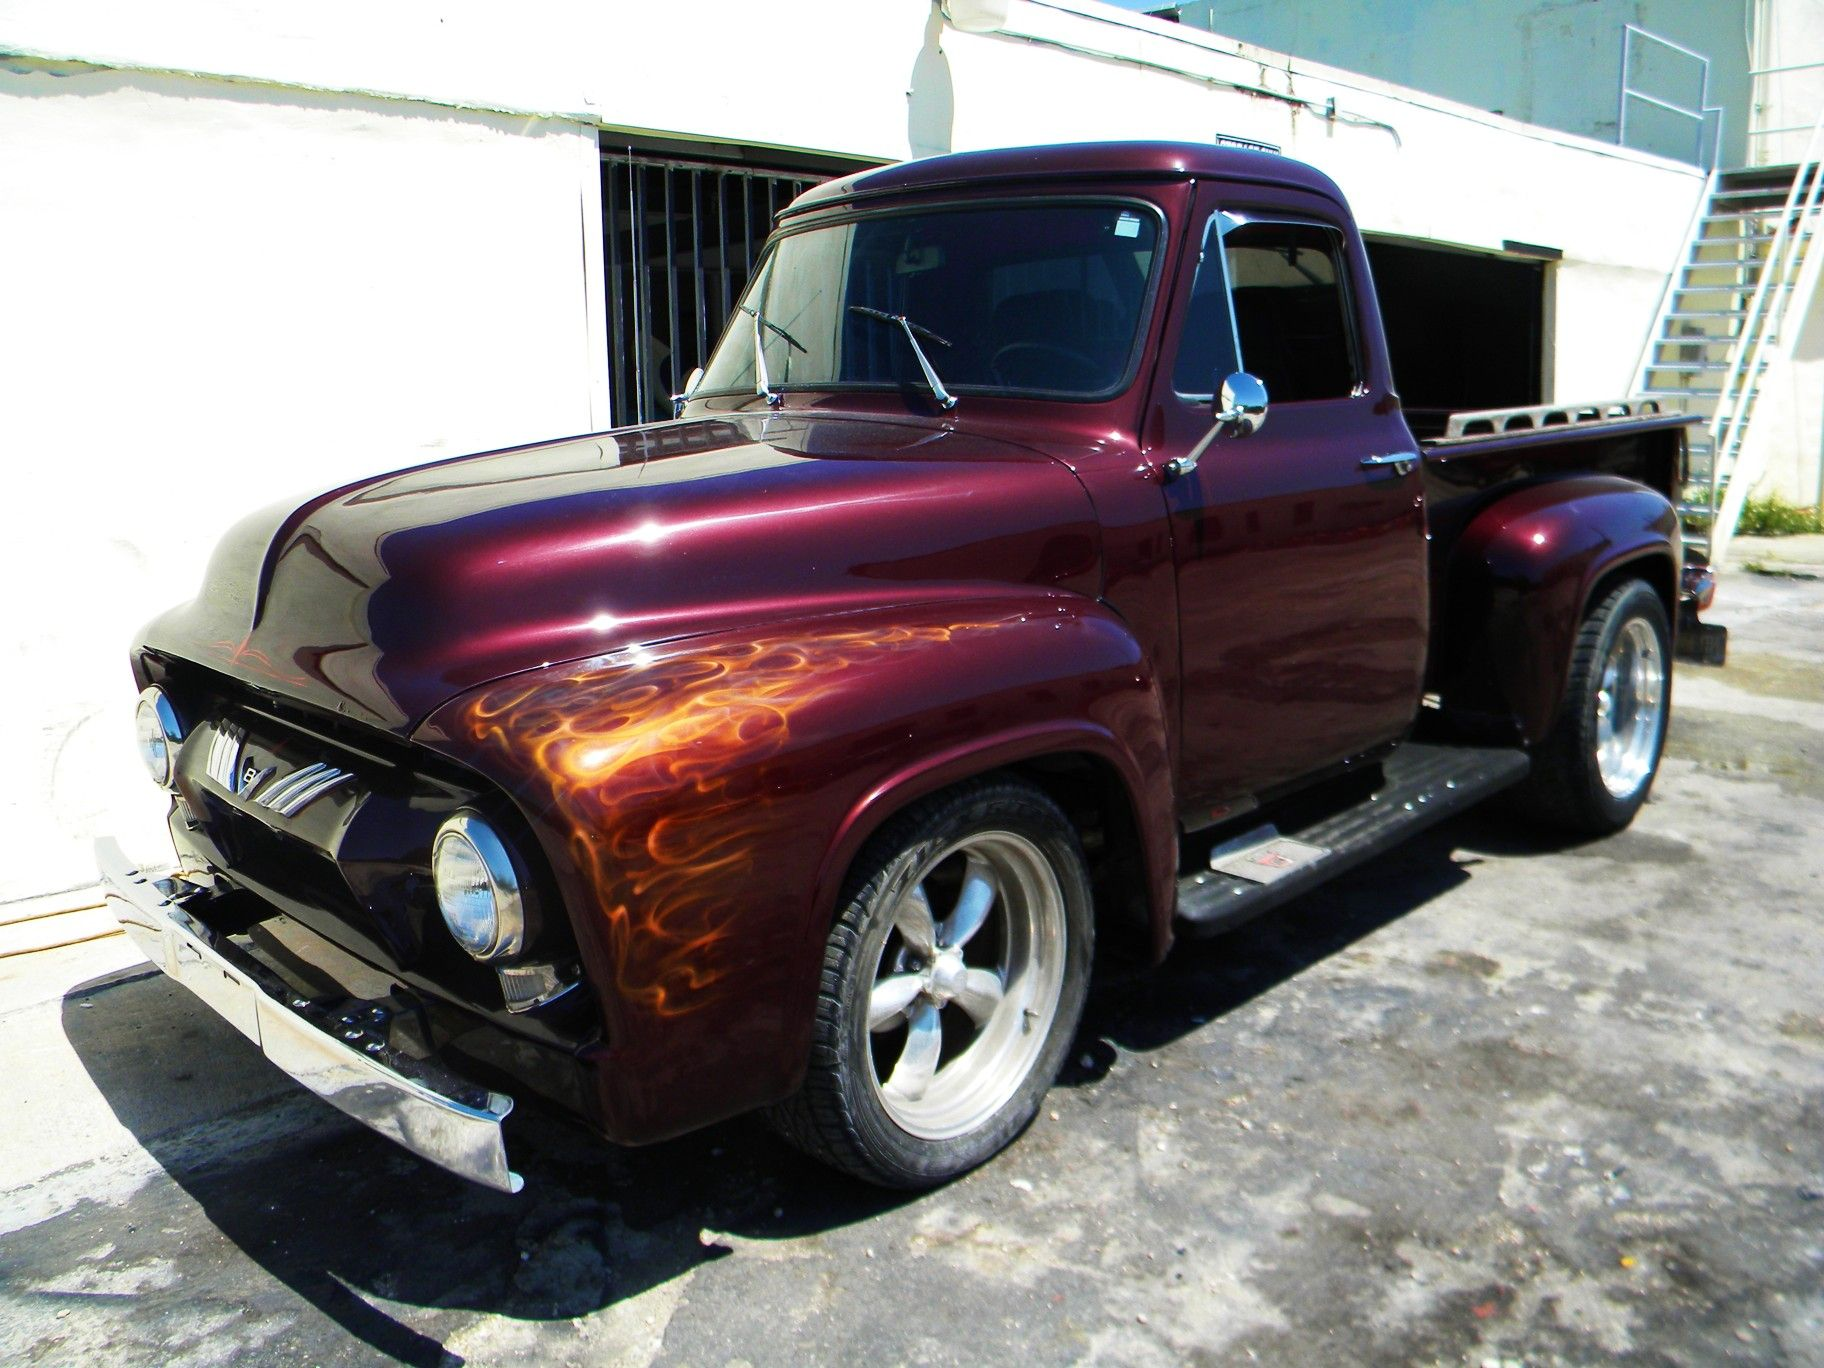 antique+cars+&+trucks+burgundy+colored | ... door Pick up Street Rod ...